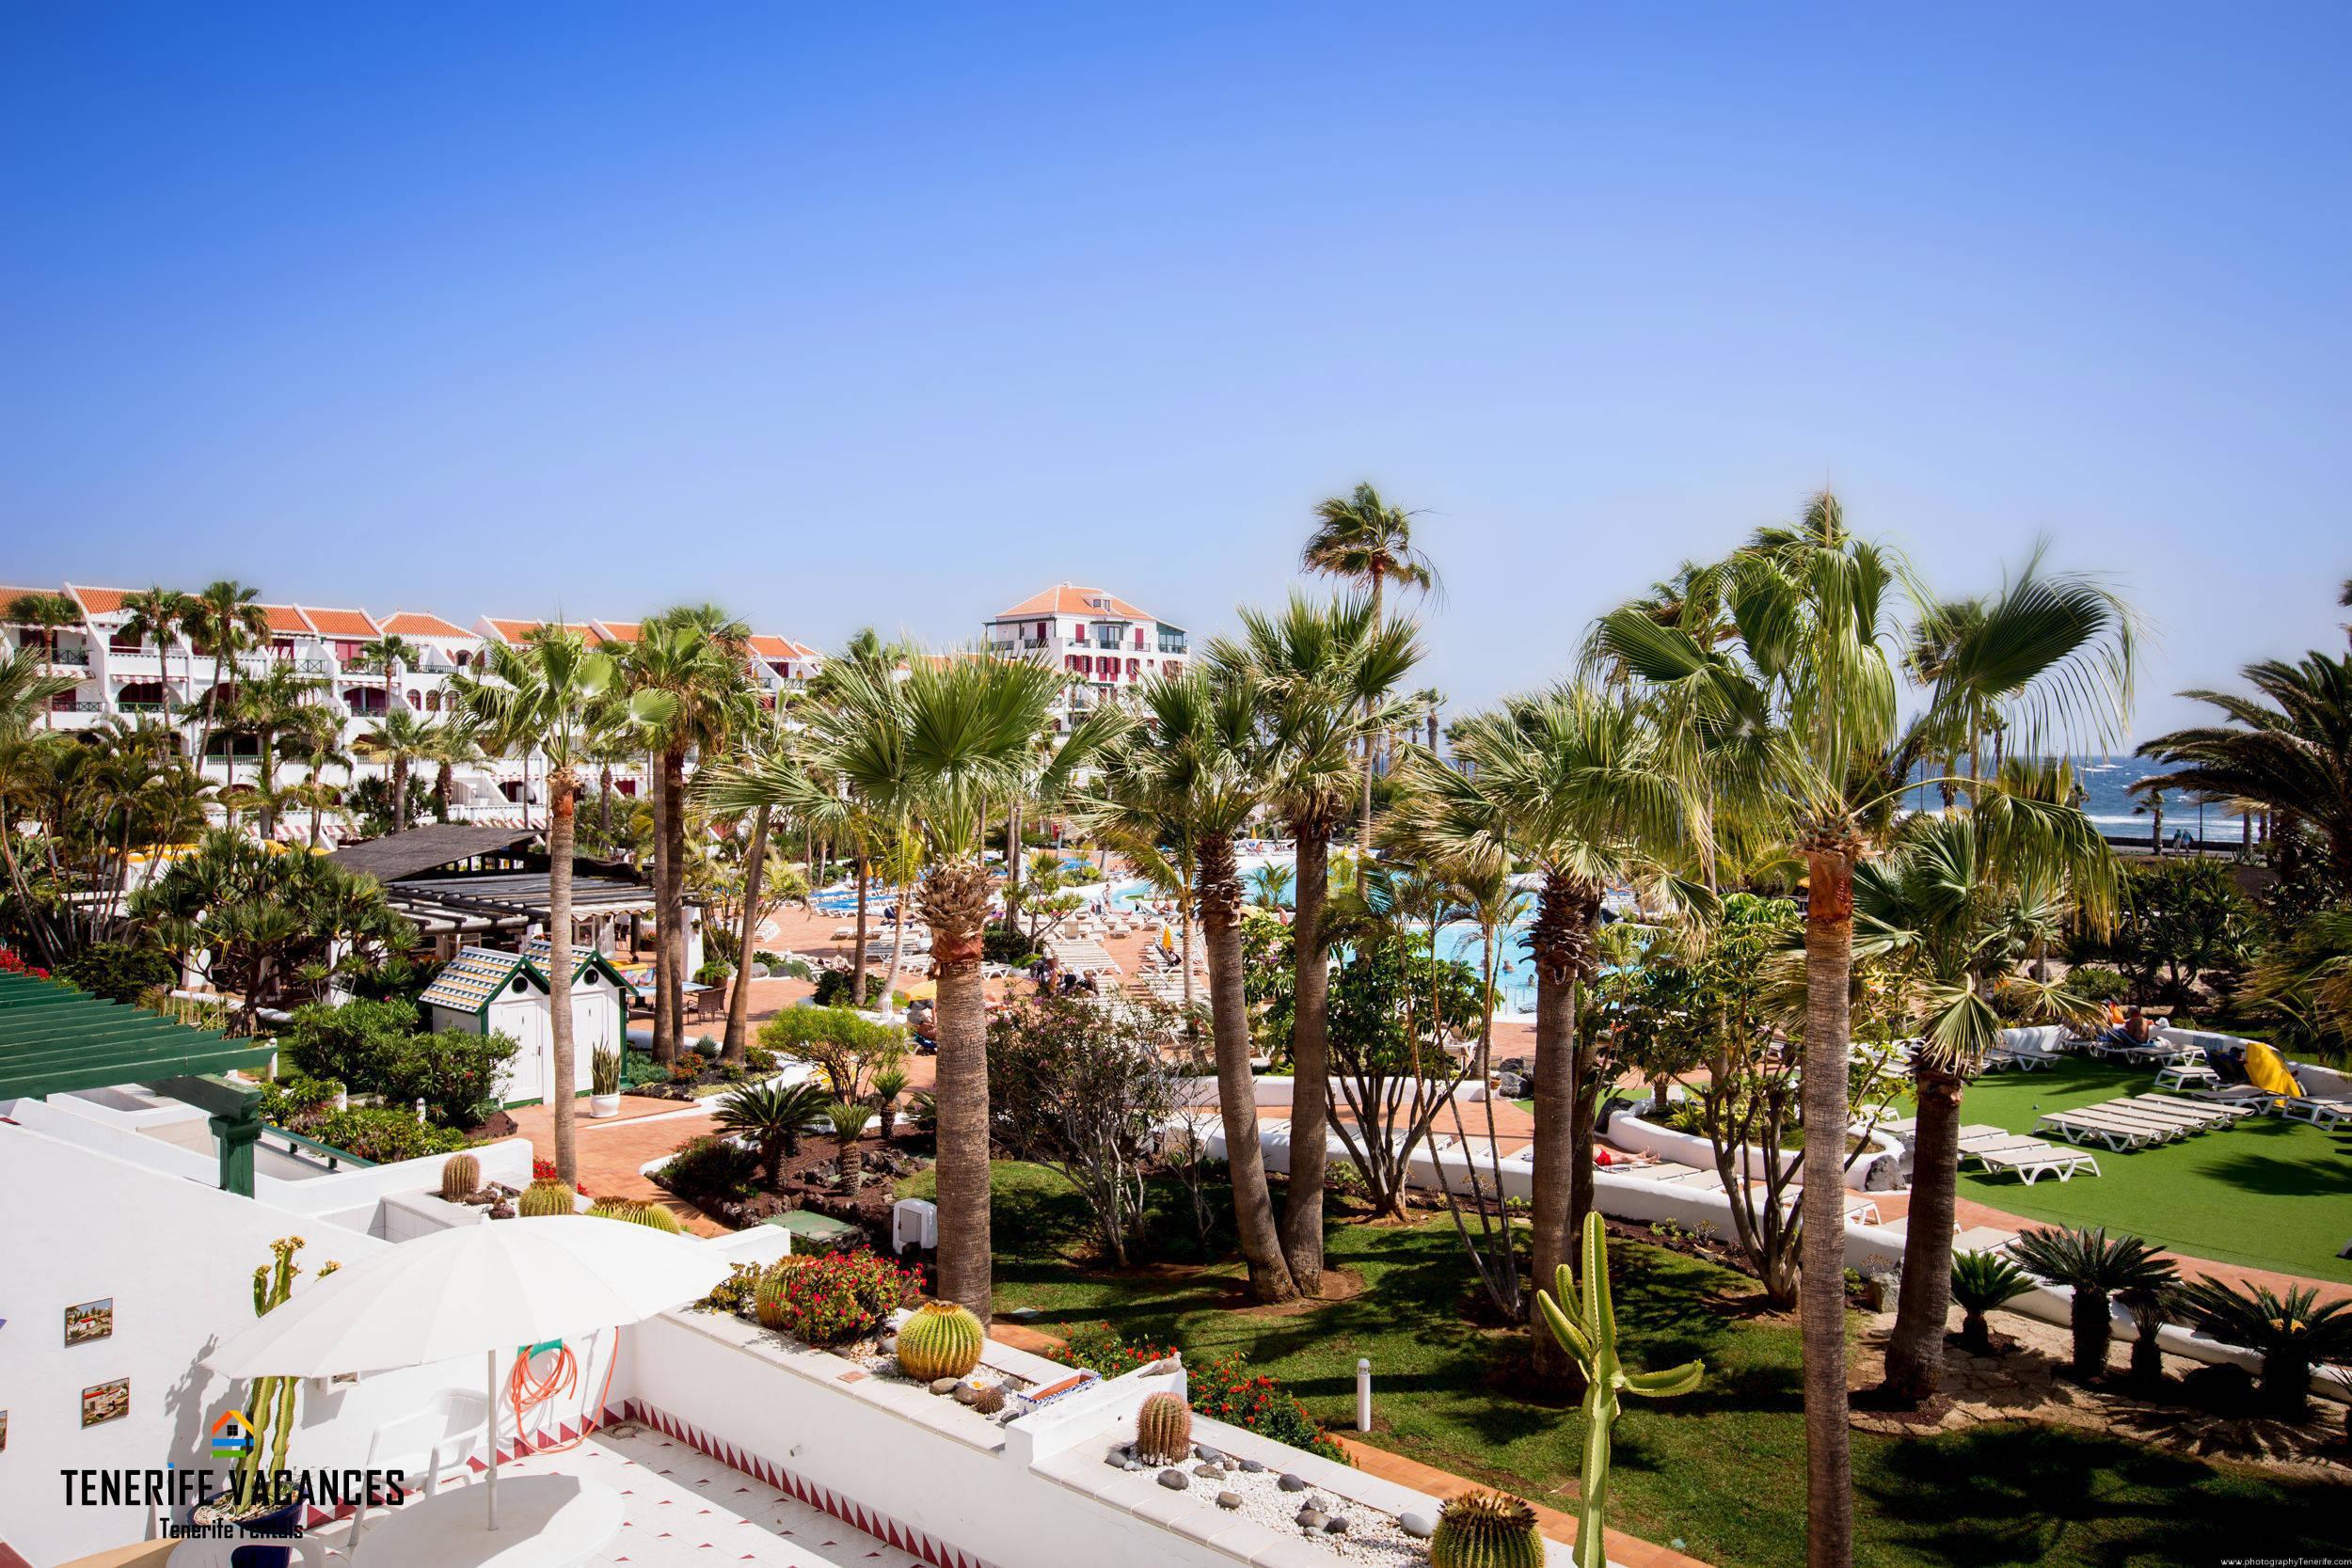 apartamento 4 Sunprime Coral Tenerife Vacances 2019